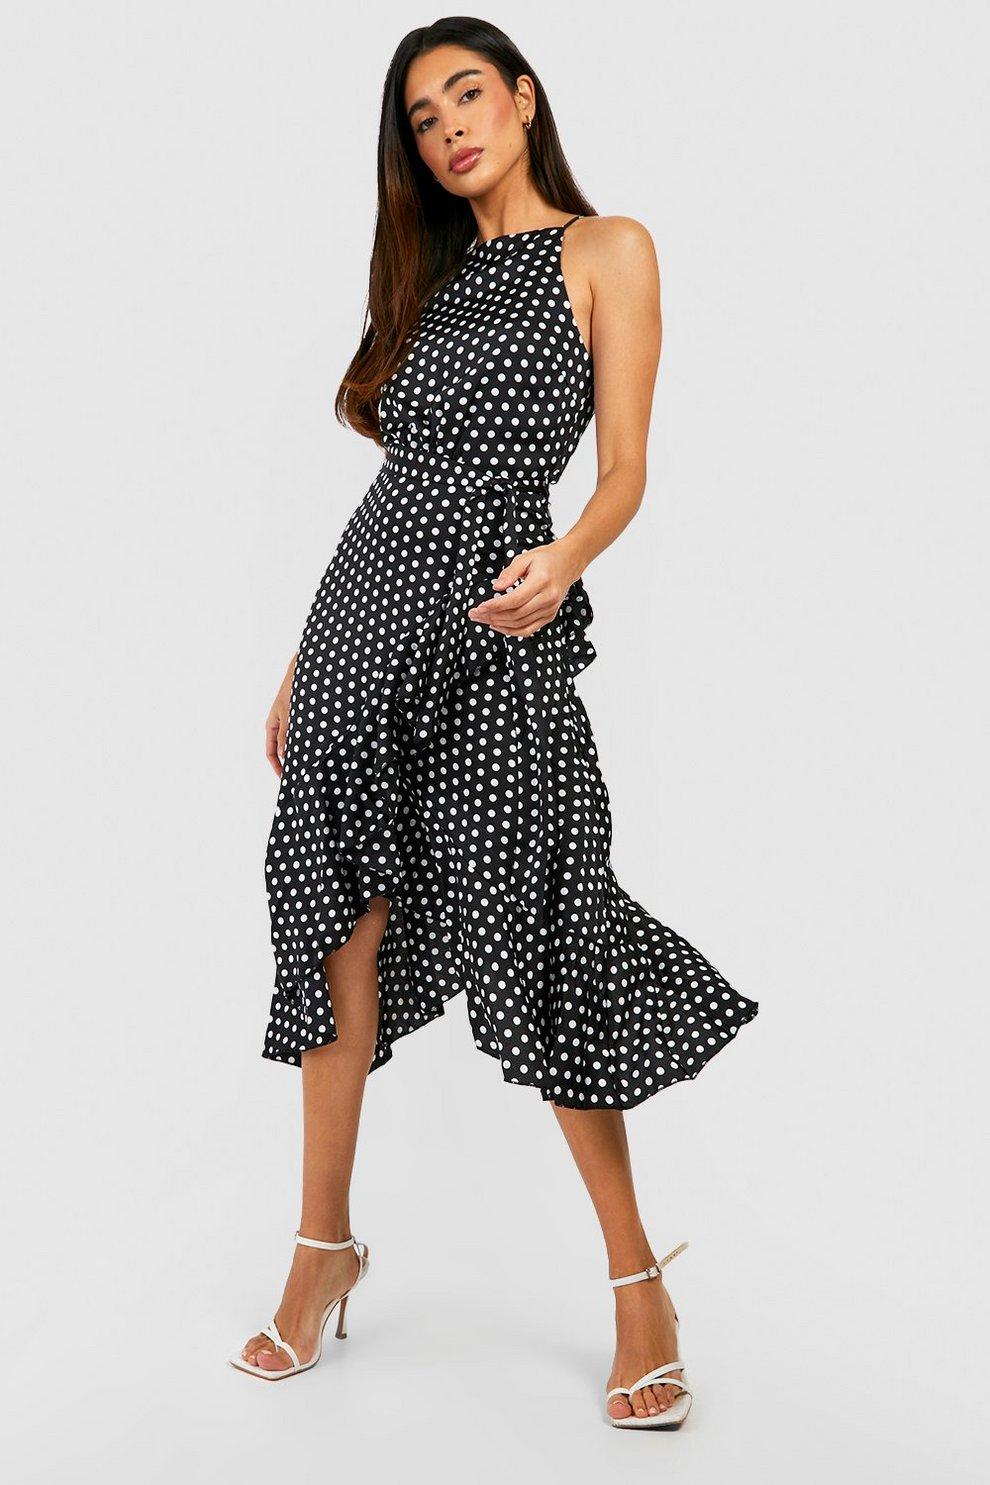 0ec2e9e14505 Satin Polka Dot Frill Detail Midi Dress | Boohoo